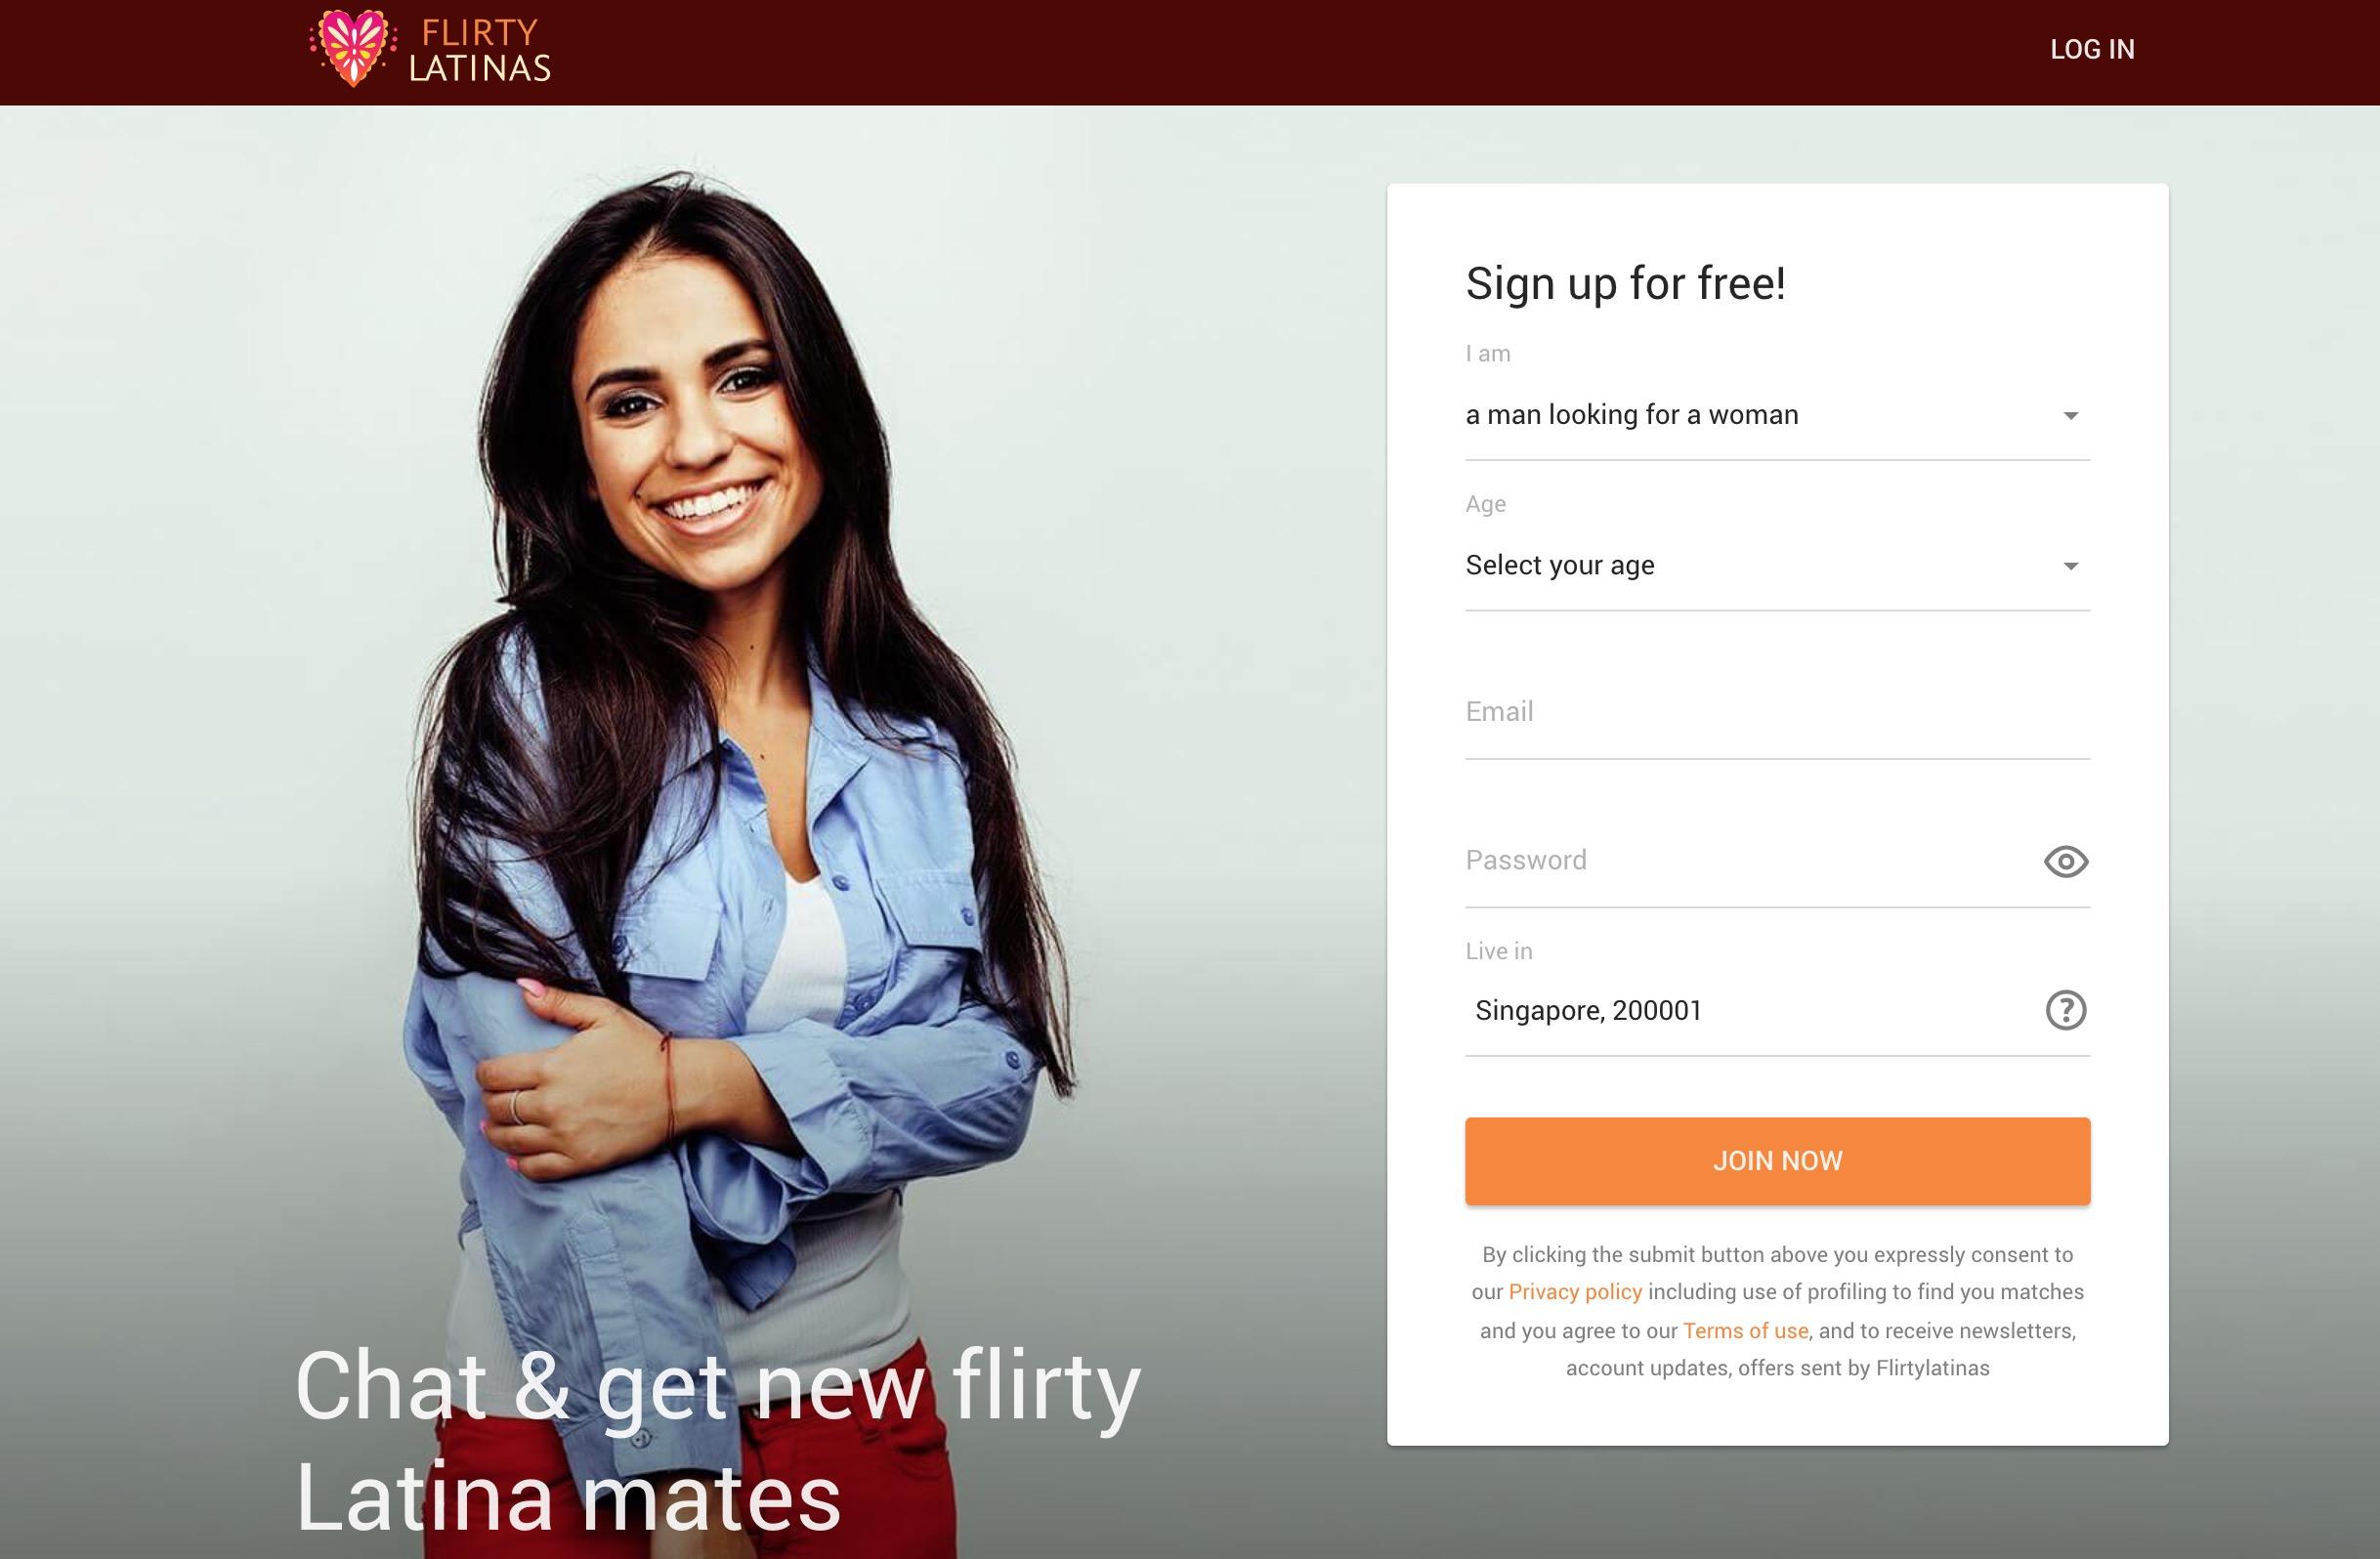 FlirtyLatinas main page